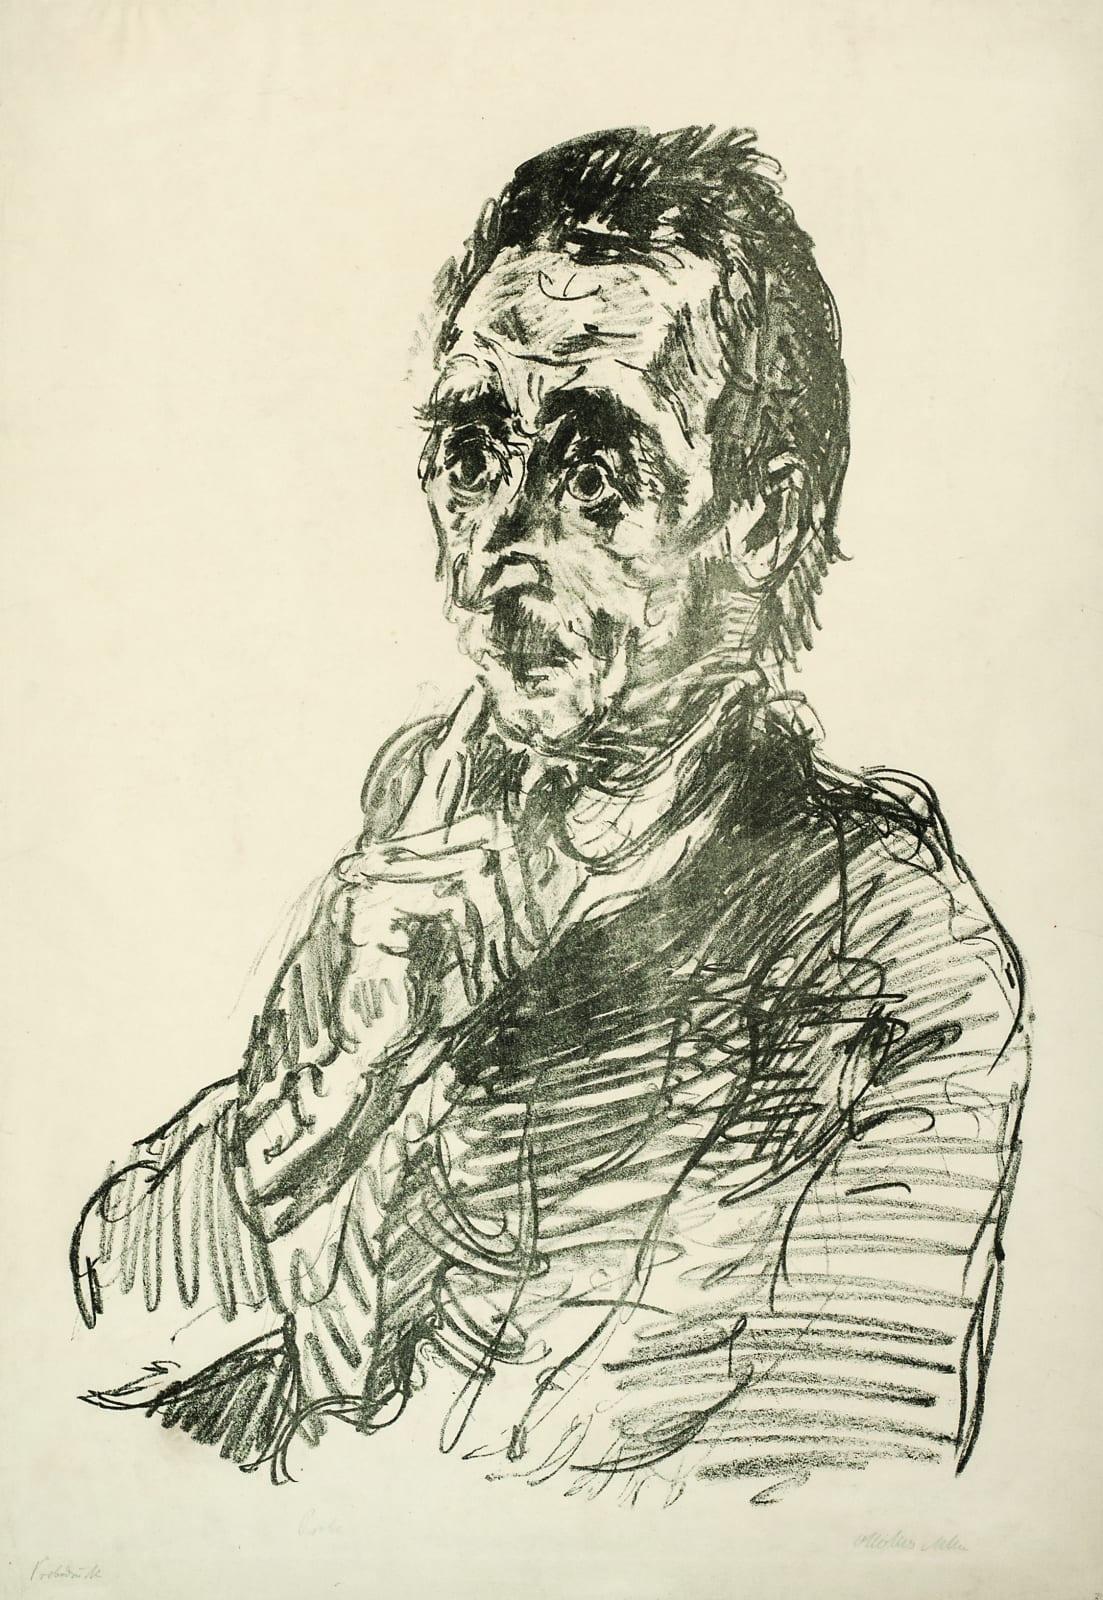 Oskar Kokoschka Ivar von Lucken, 1918